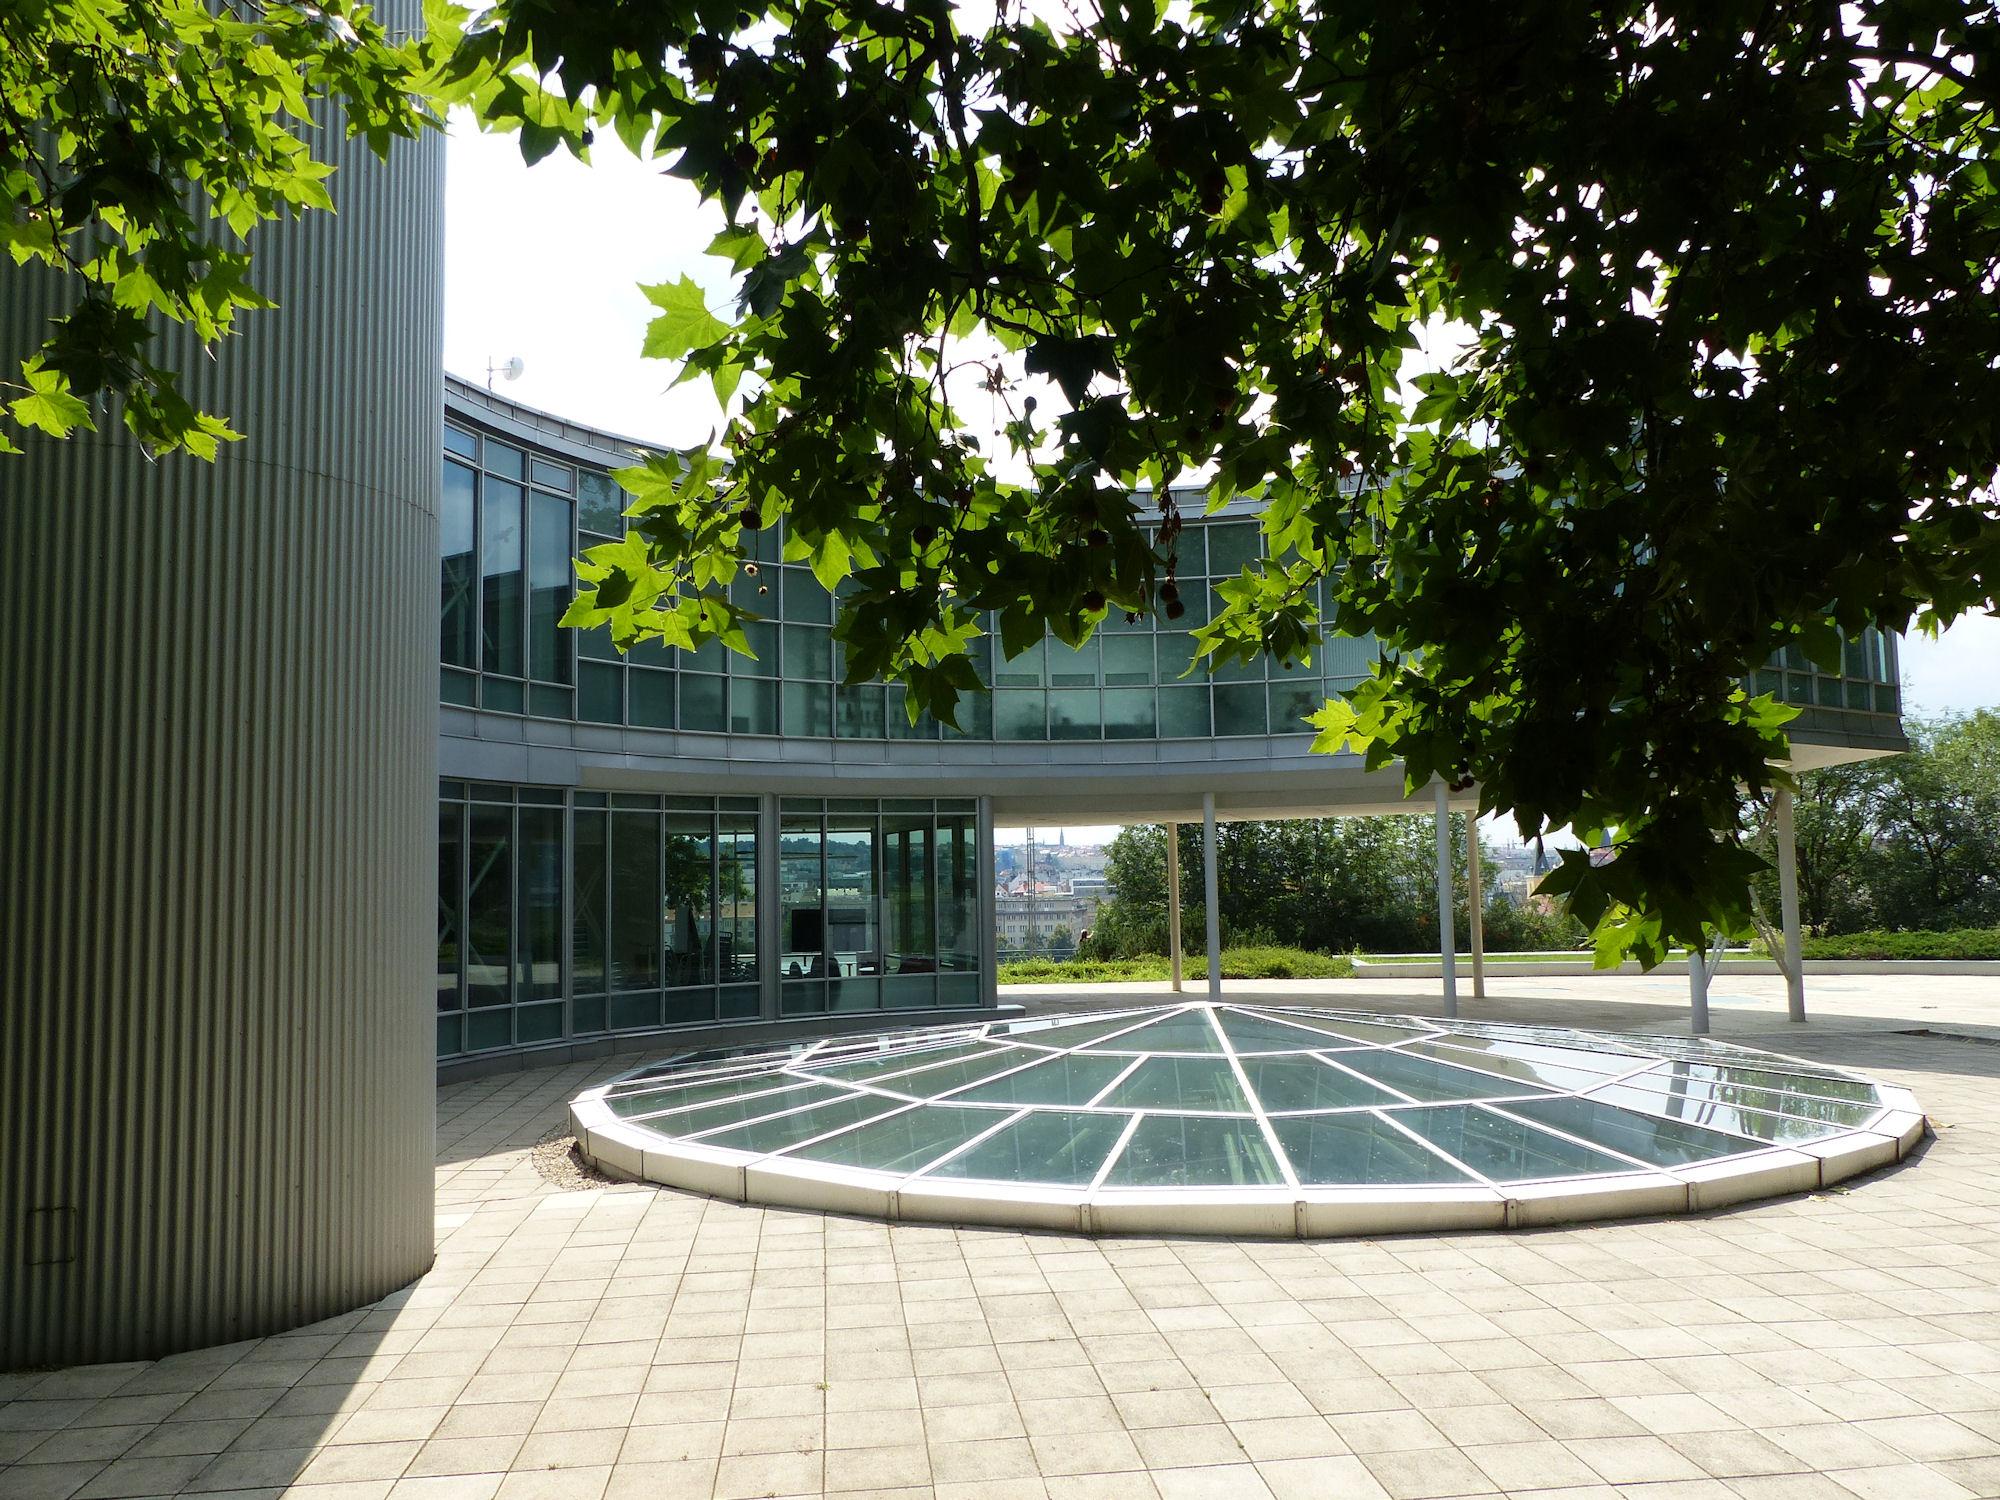 Expo 58 Pavilion, Prague